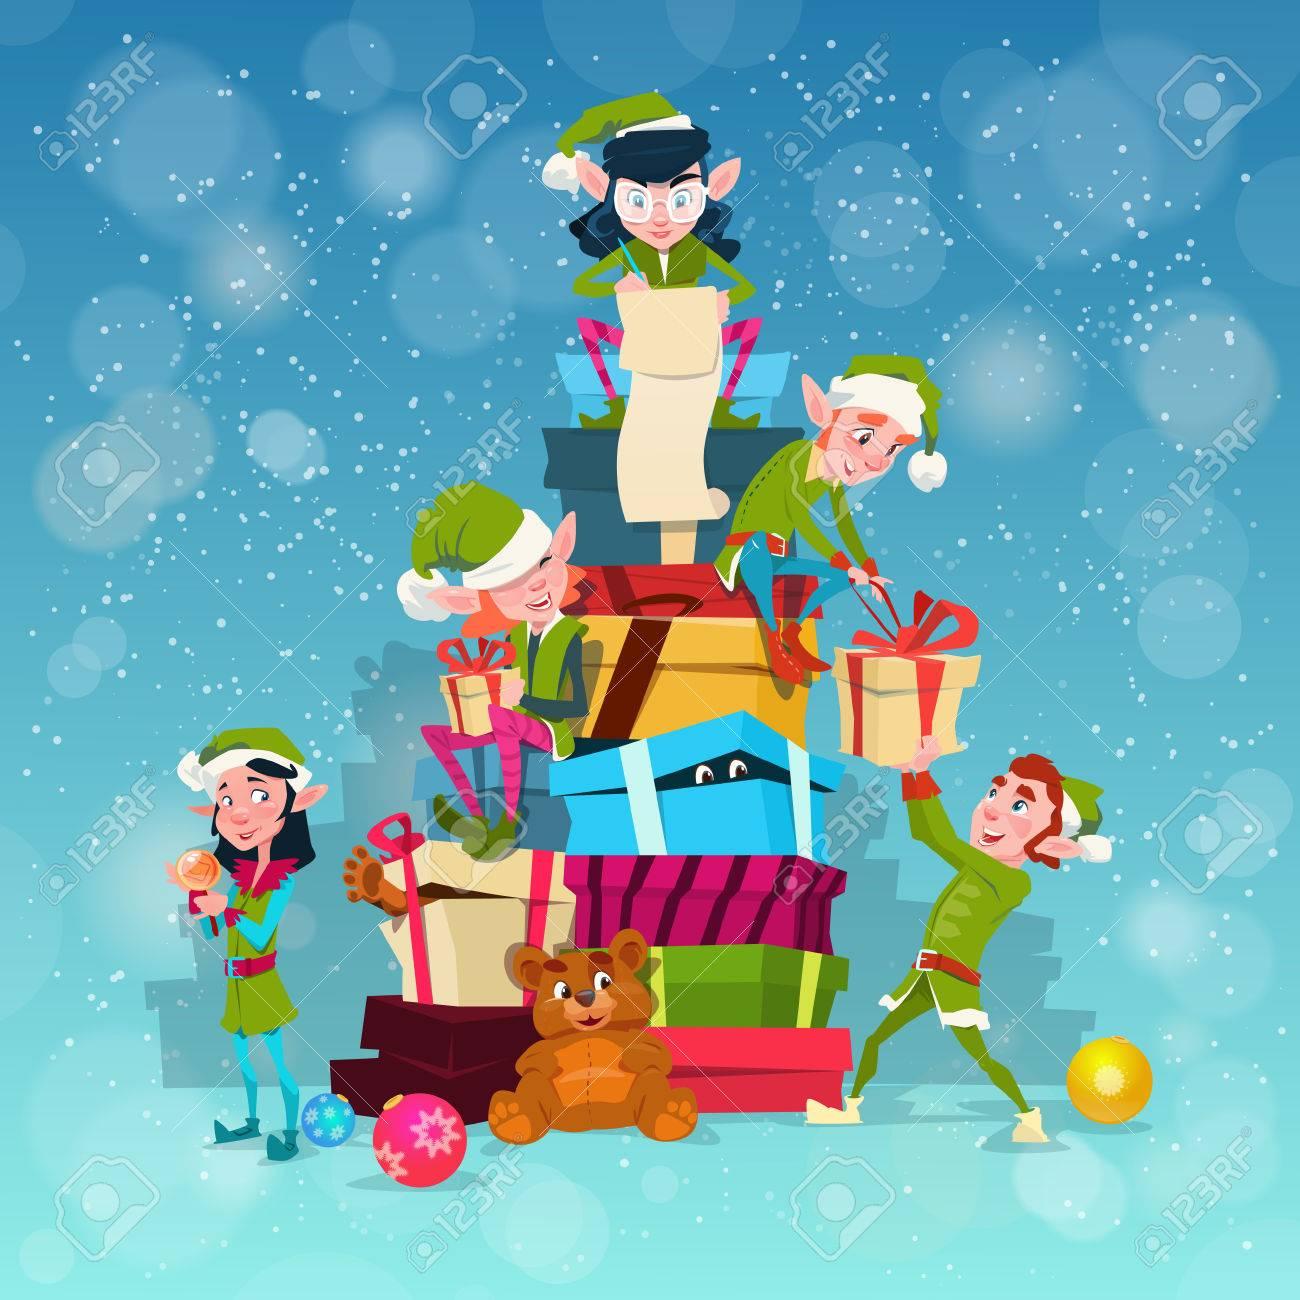 Christmas elf group cartoon character santa helper with present box stack  flat vector illustration stock vector 1c9c7c04a